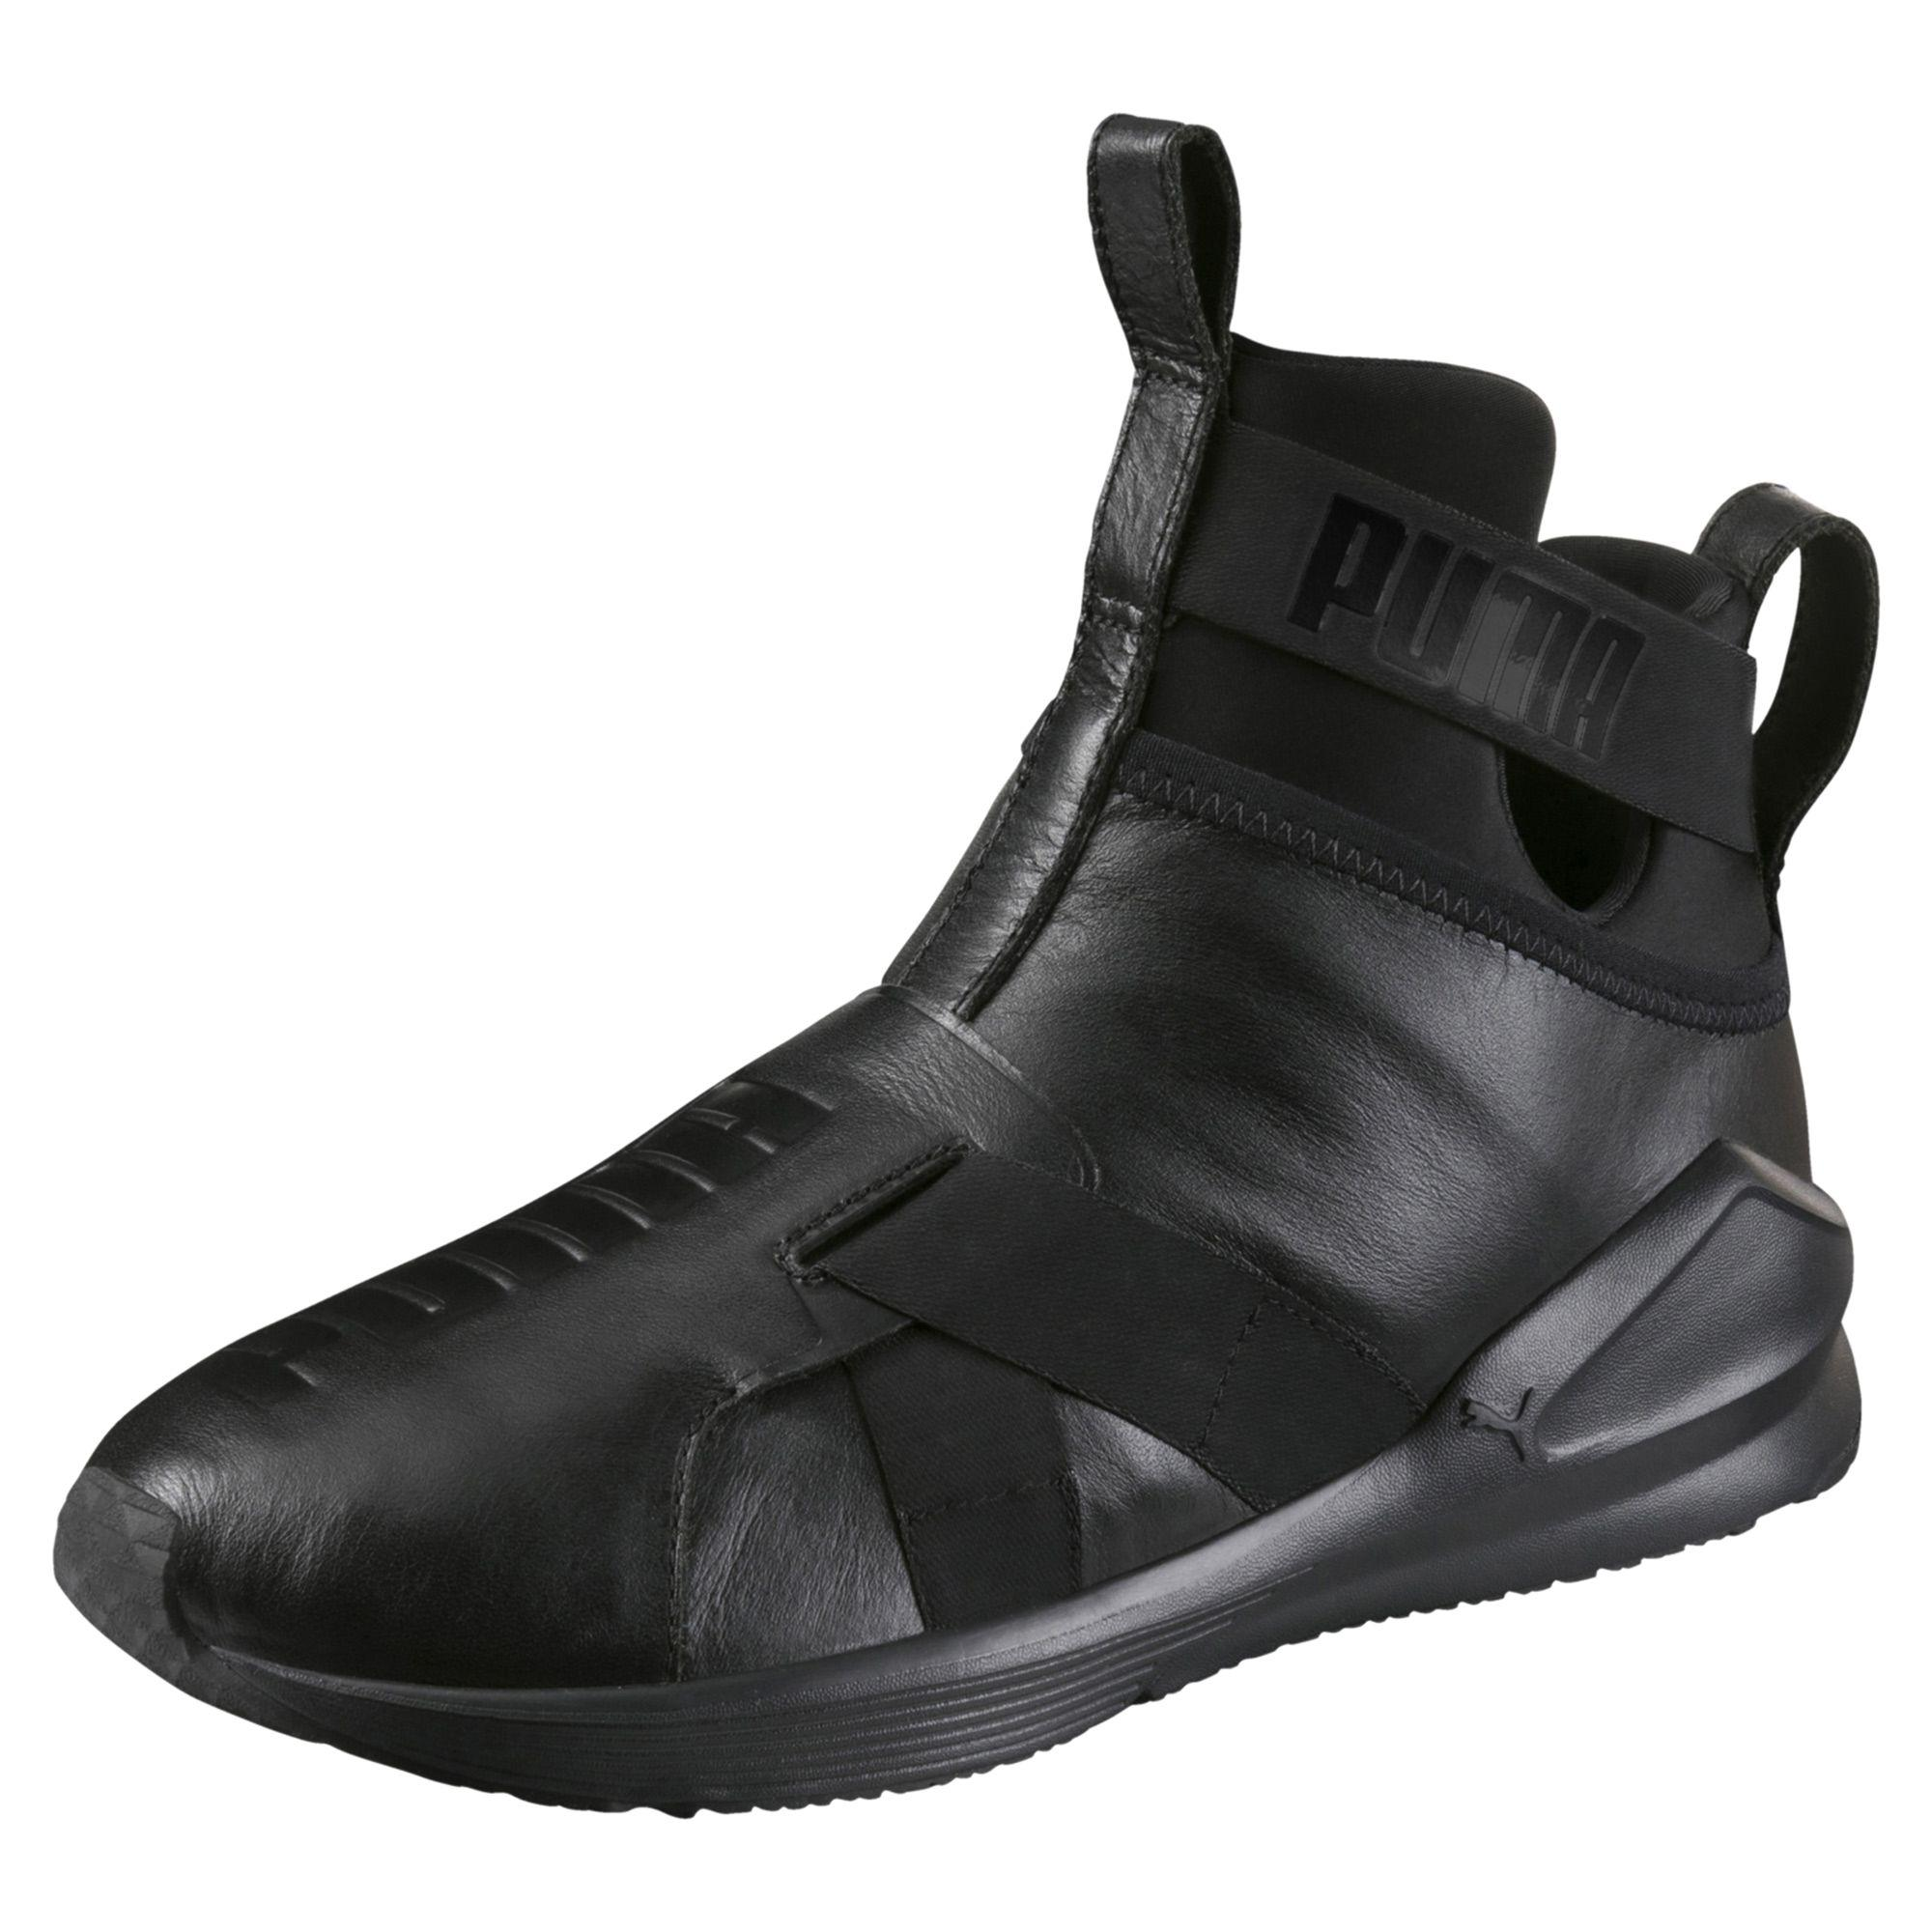 85a897518152 Lyst - PUMA Fierce Strap Leather Women s Training Shoes in Black